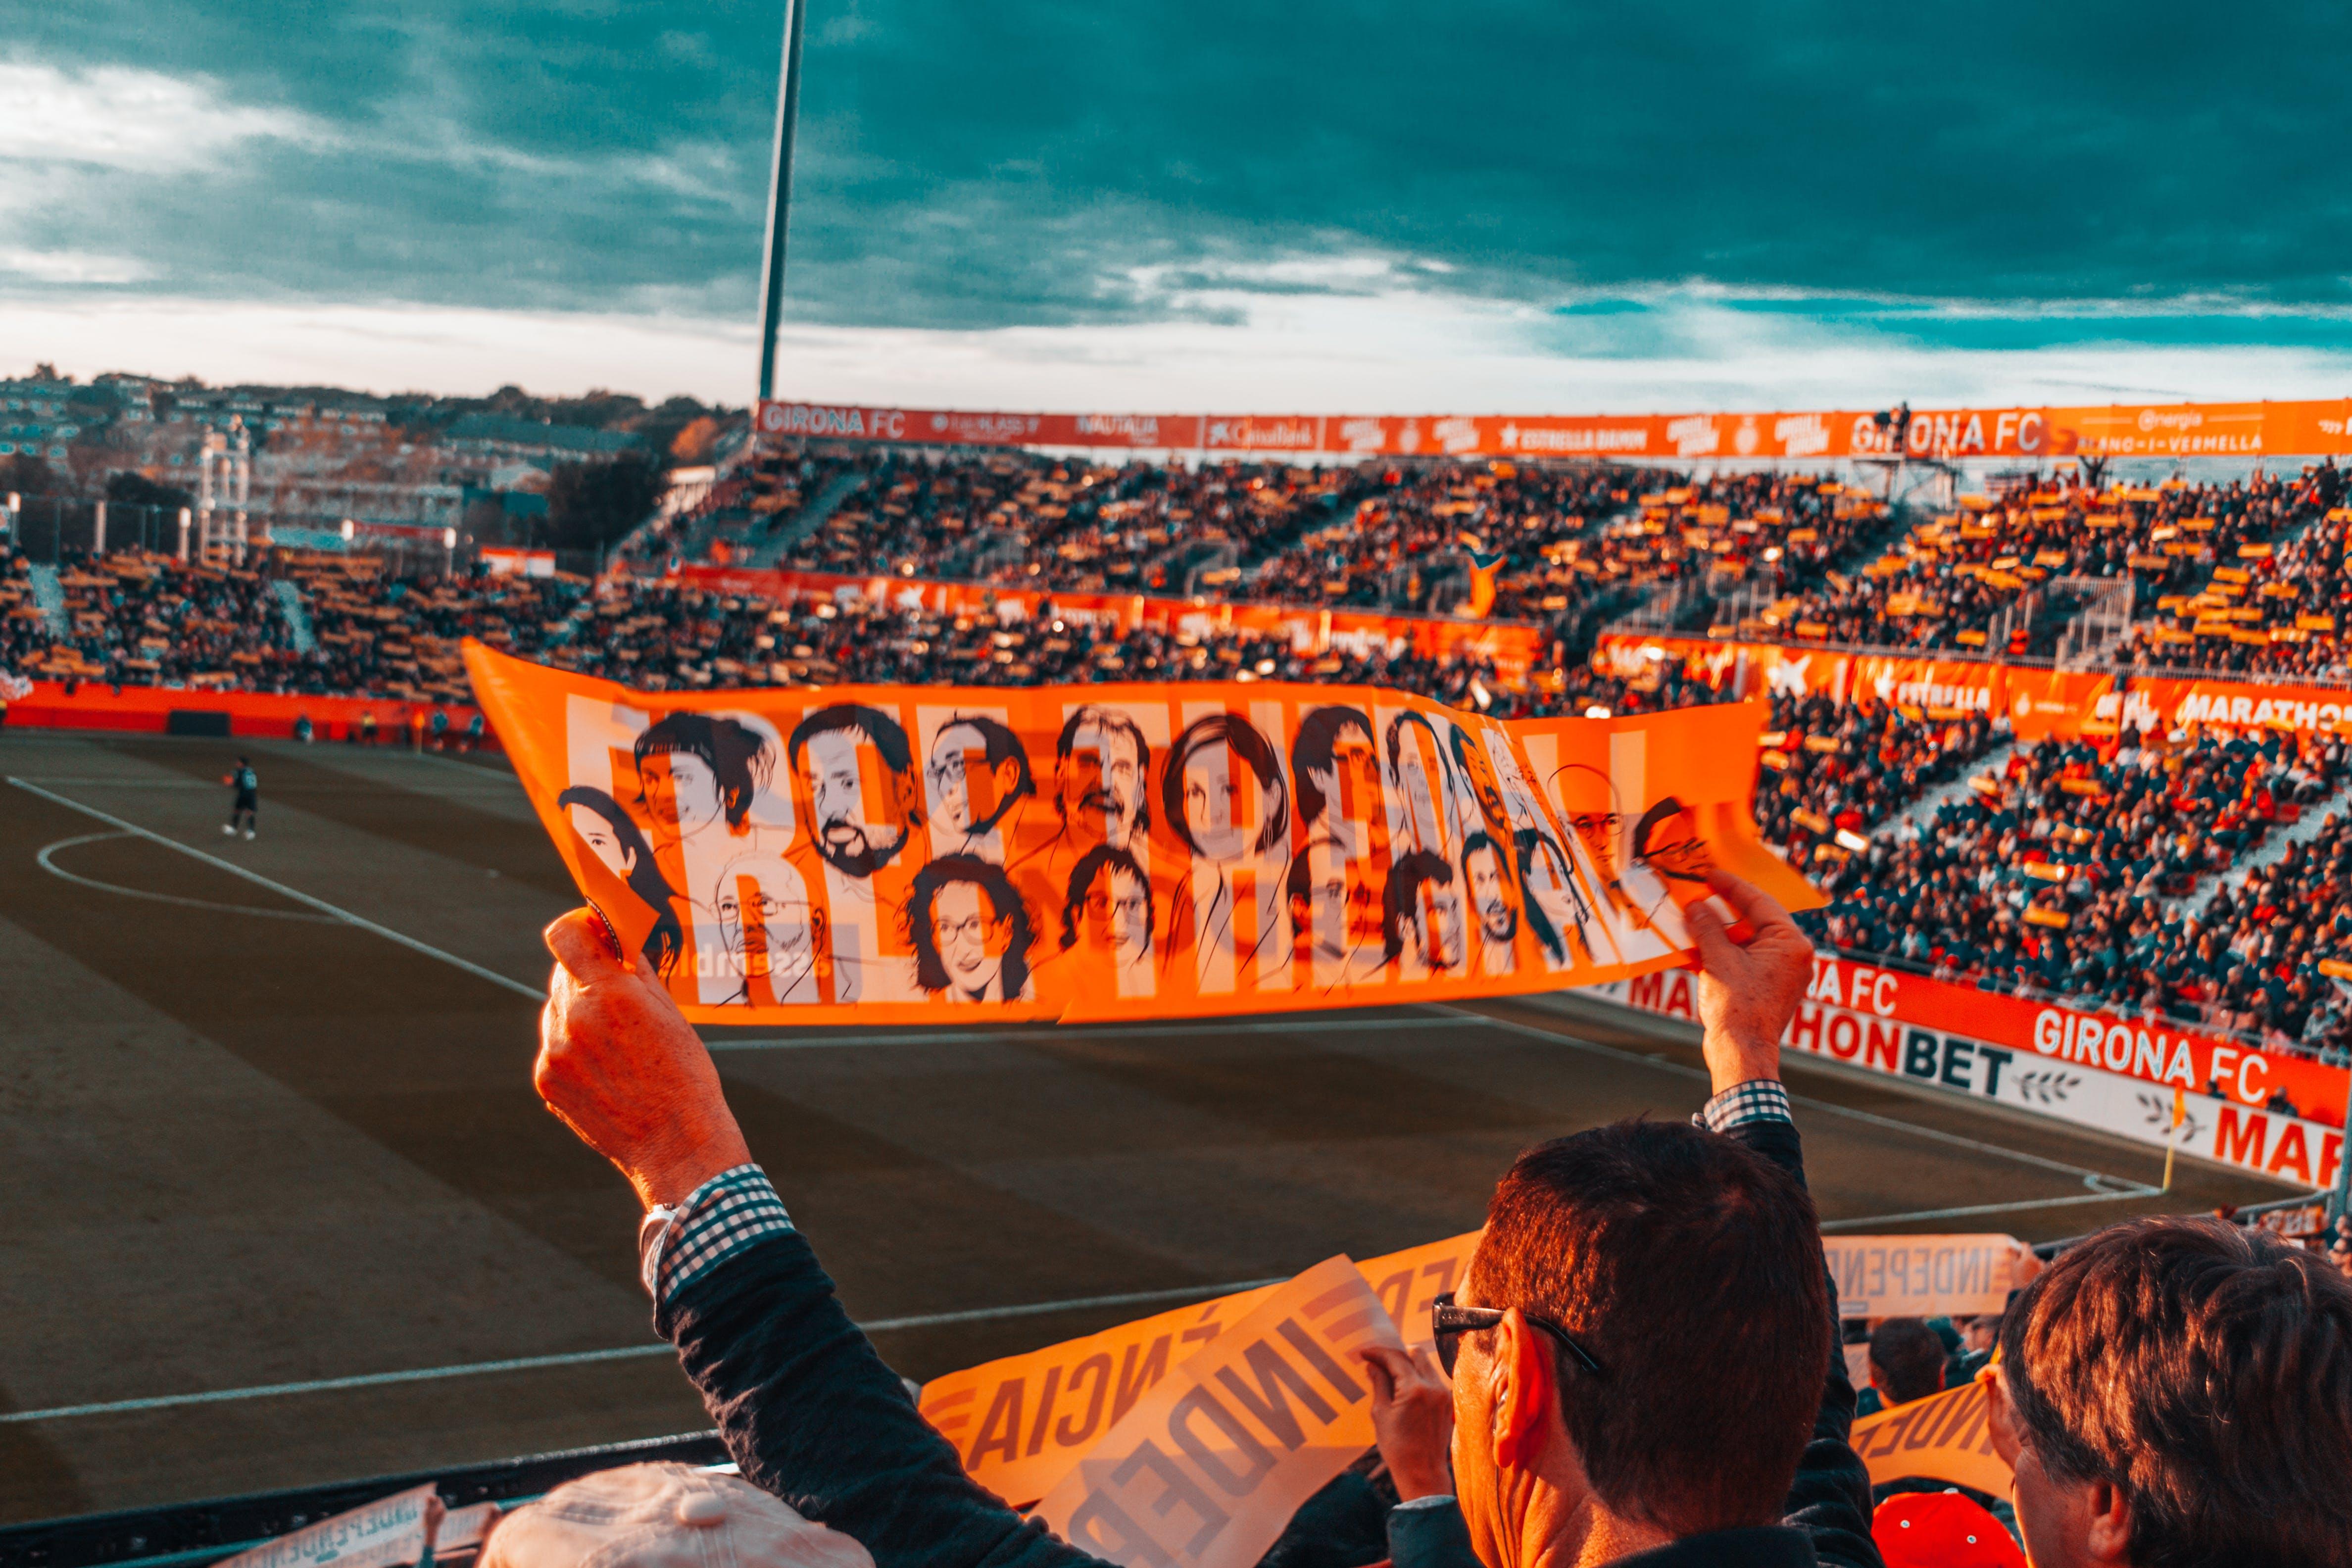 Person Holding Orange Banner on Stadium